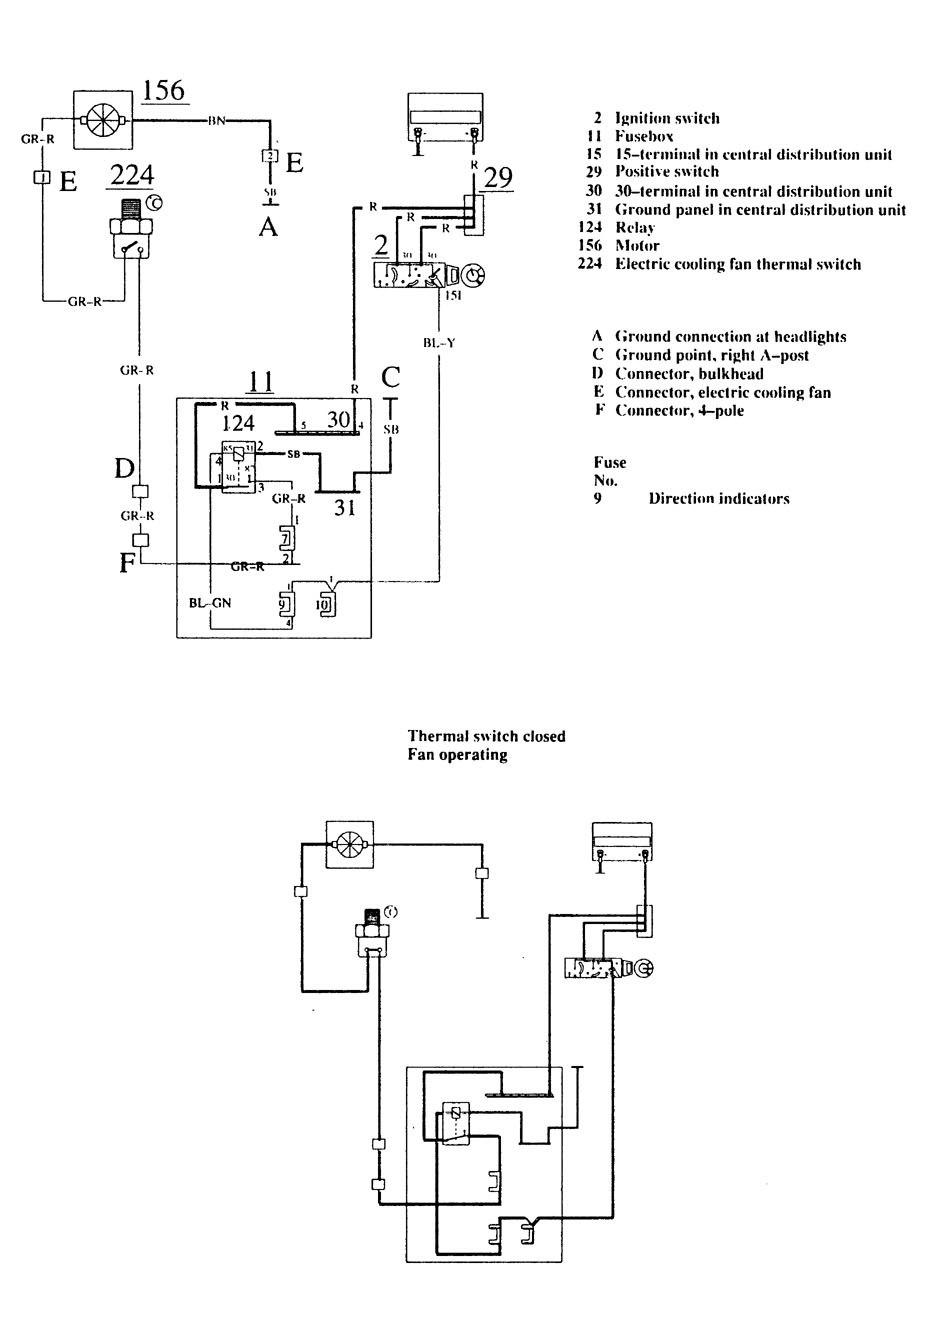 1989 Volvo 740 Wiring Diagram Schematic Diagrams Trusted Semi Truck